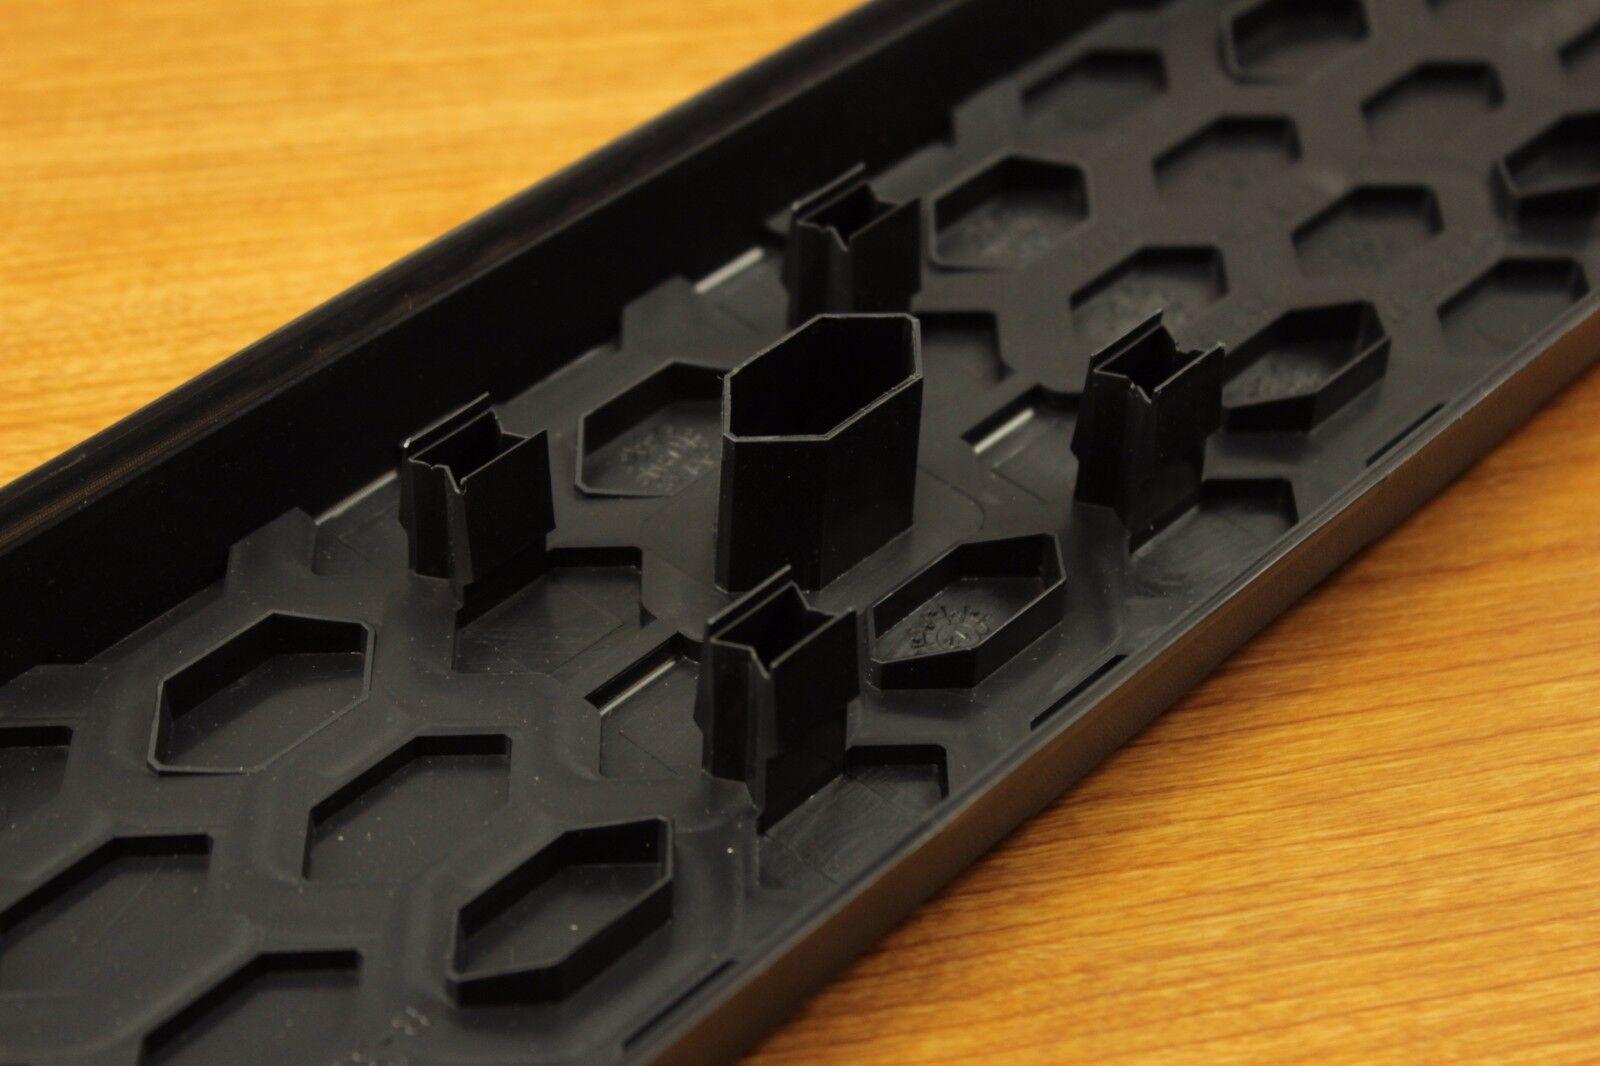 ram side step nerf bar replacement step pad mopar oem ebay